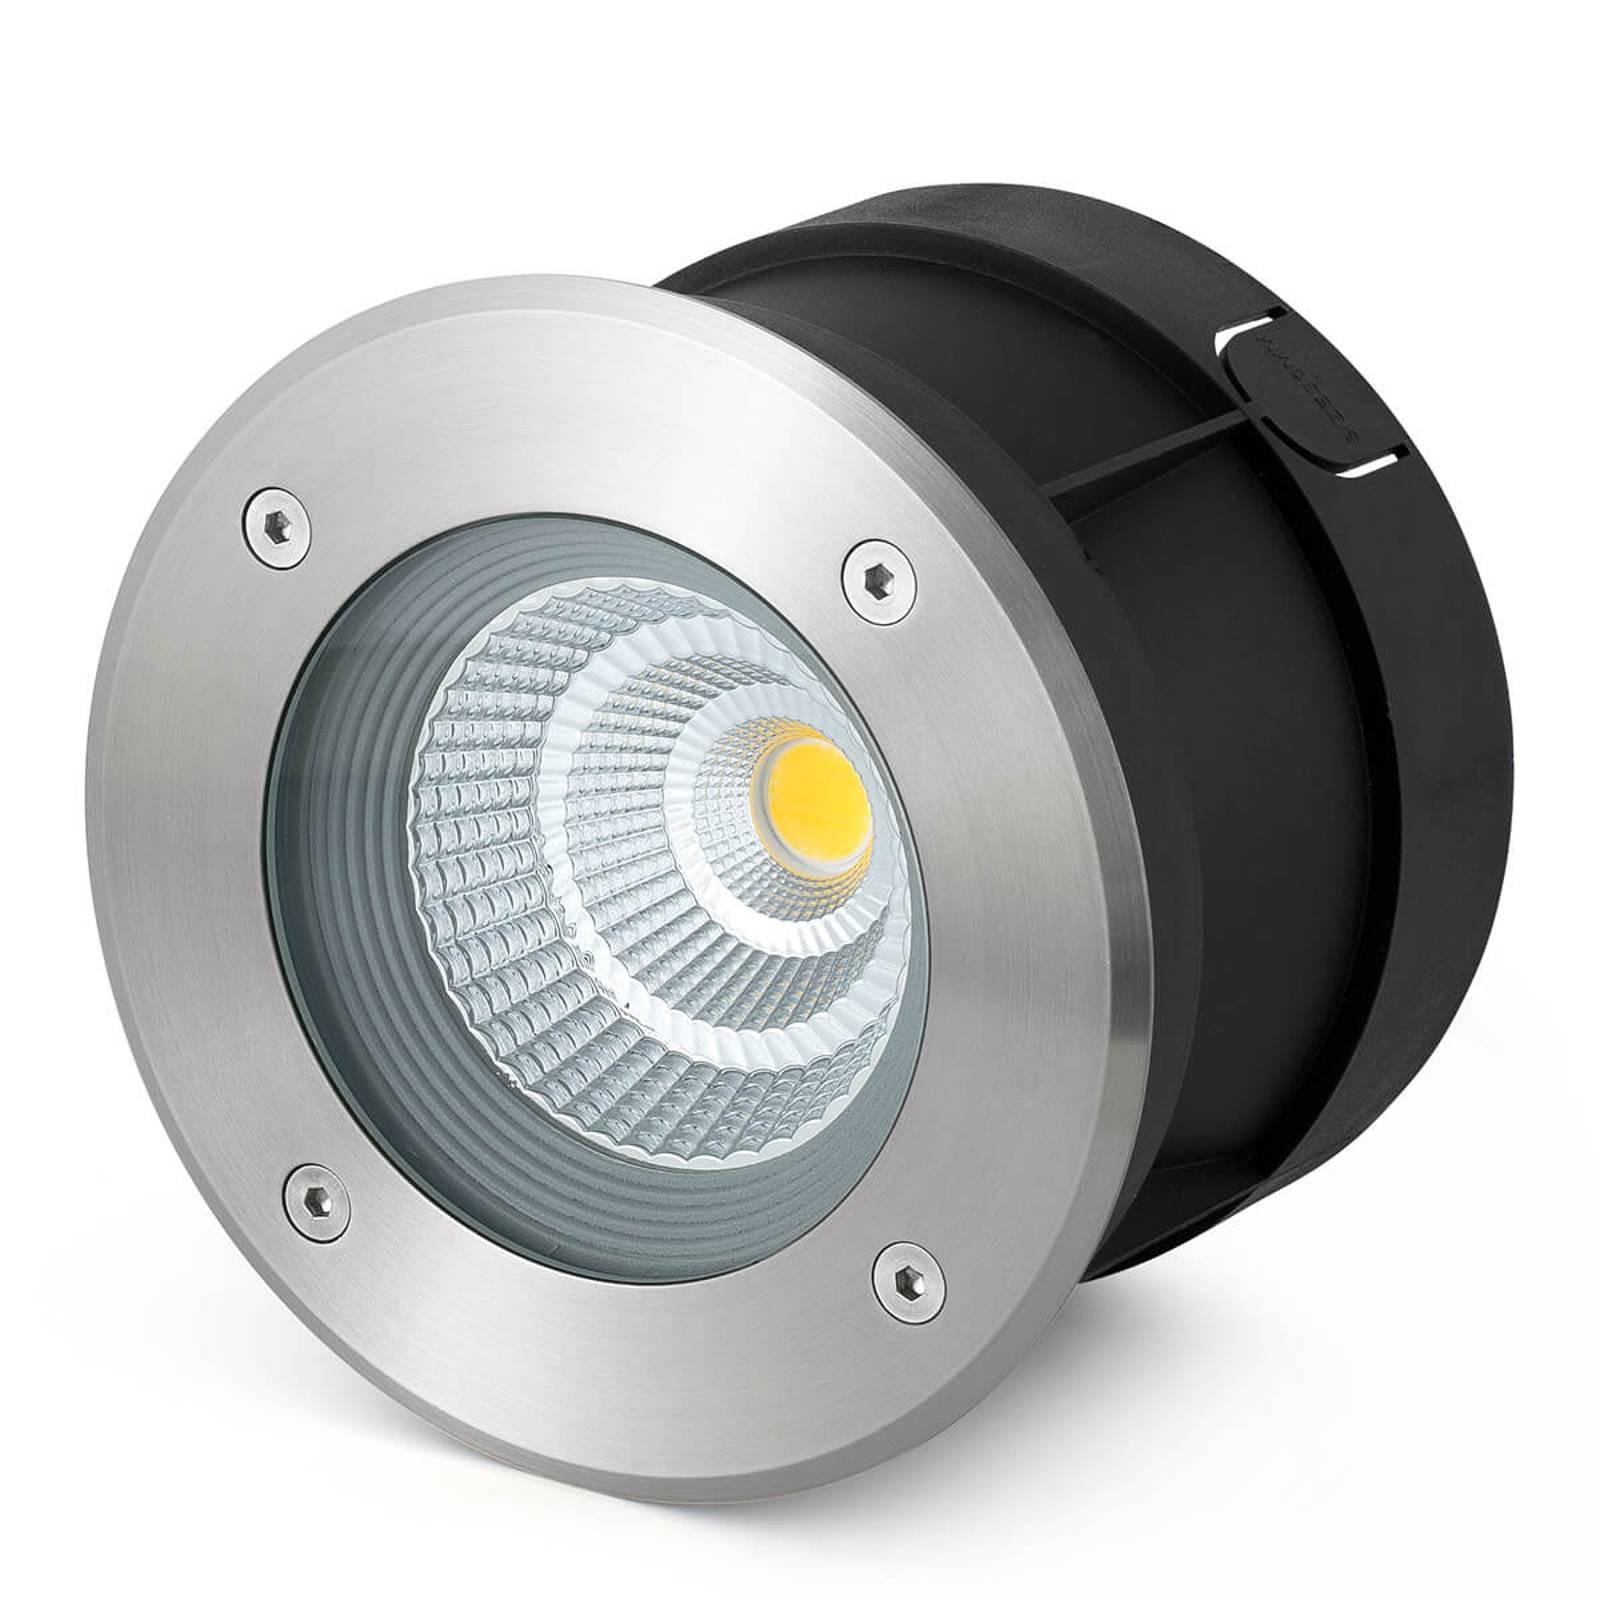 Suria-12-LED-uppovalo, IP67